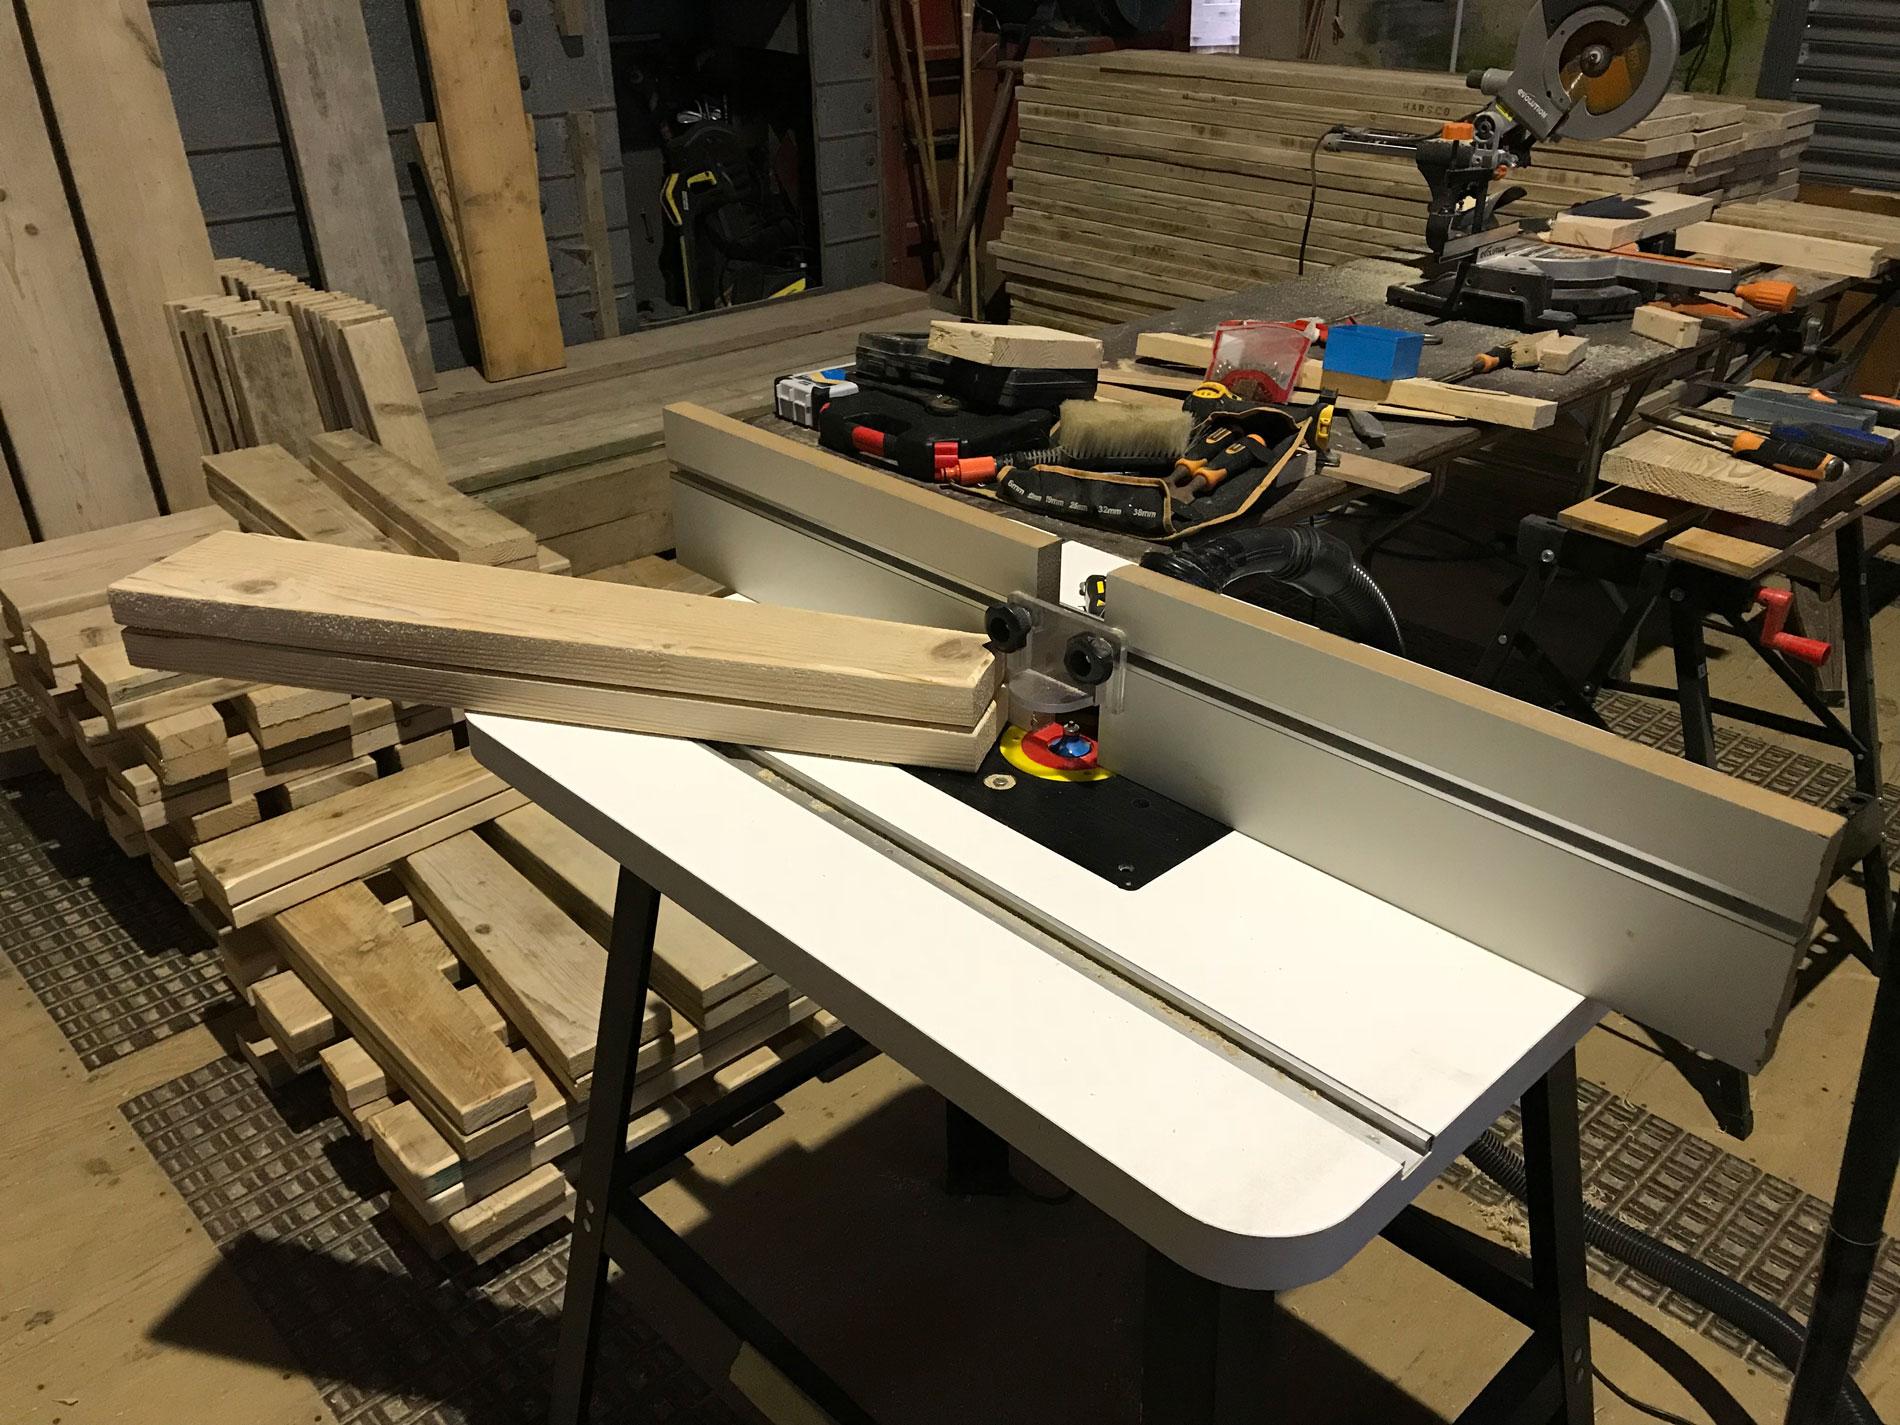 wood being cut